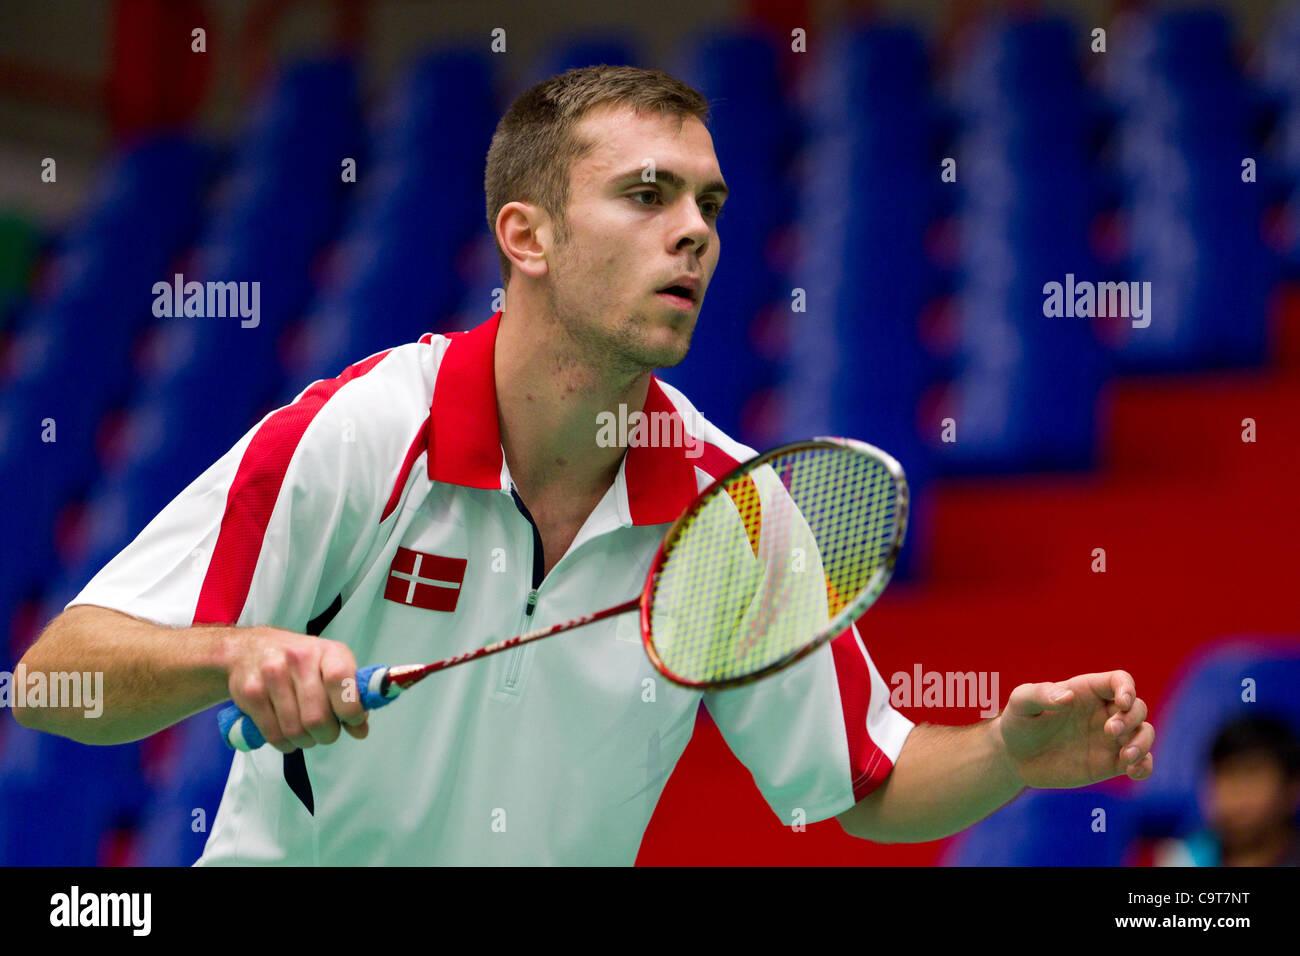 AMSTERDAM, THE NETHERLANDS, 17/02/2012. Badminton player Jan Ø. Jørgensen (Denmark, pictured) leads his - Stock Image